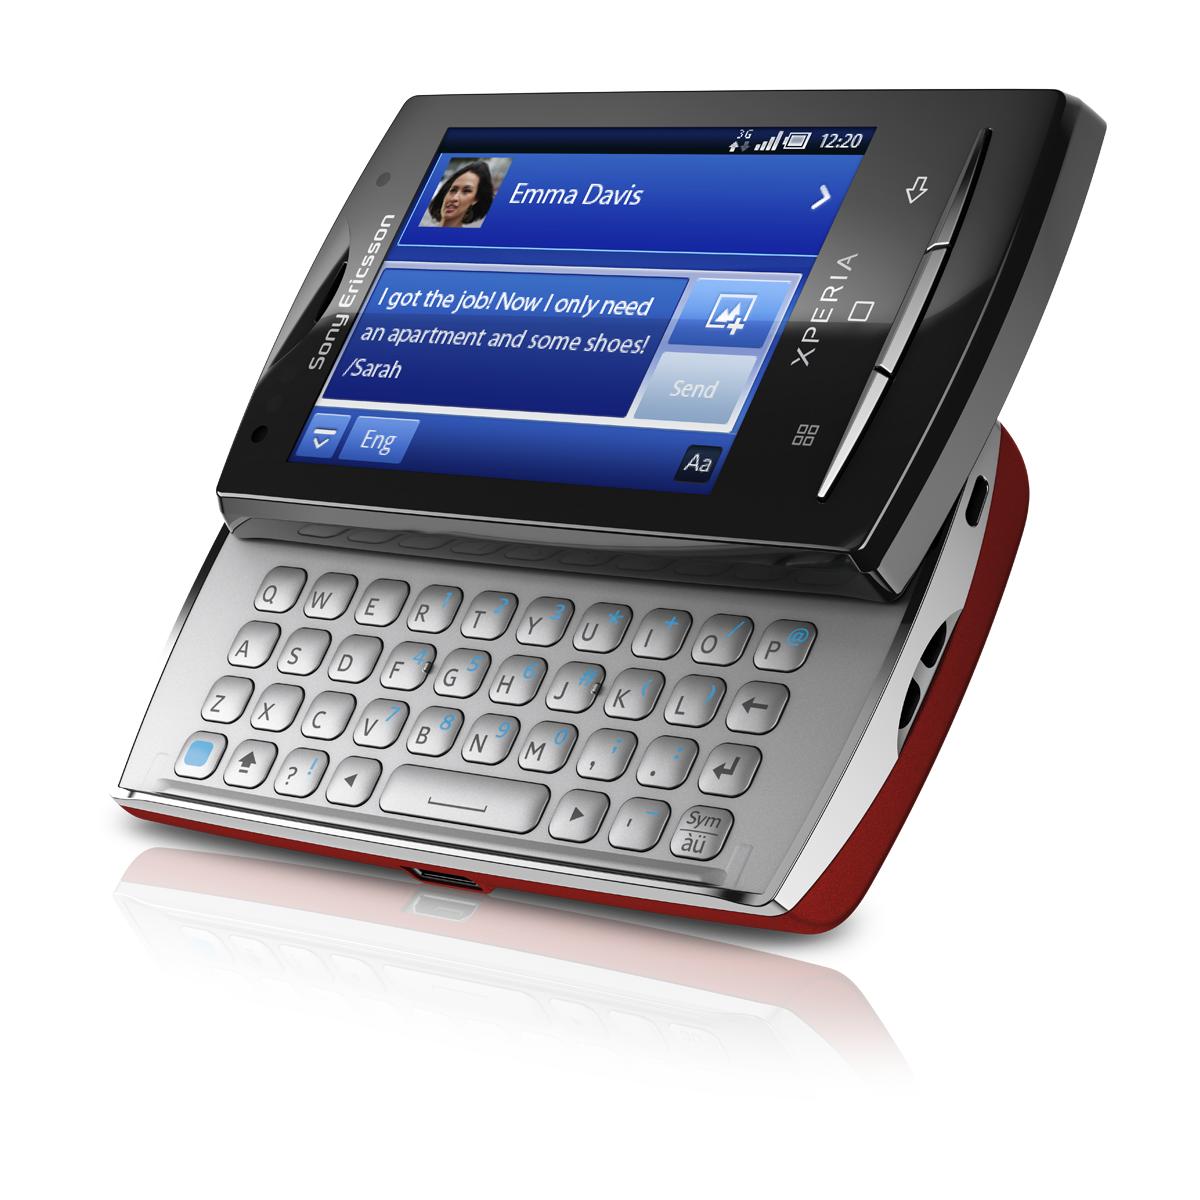 http://2.bp.blogspot.com/-YLiliSCuTr4/TpocyDIx4OI/AAAAAAAAAfg/LVEc5UjYYLQ/s1600/Sony-Ericsson-smartphone.png